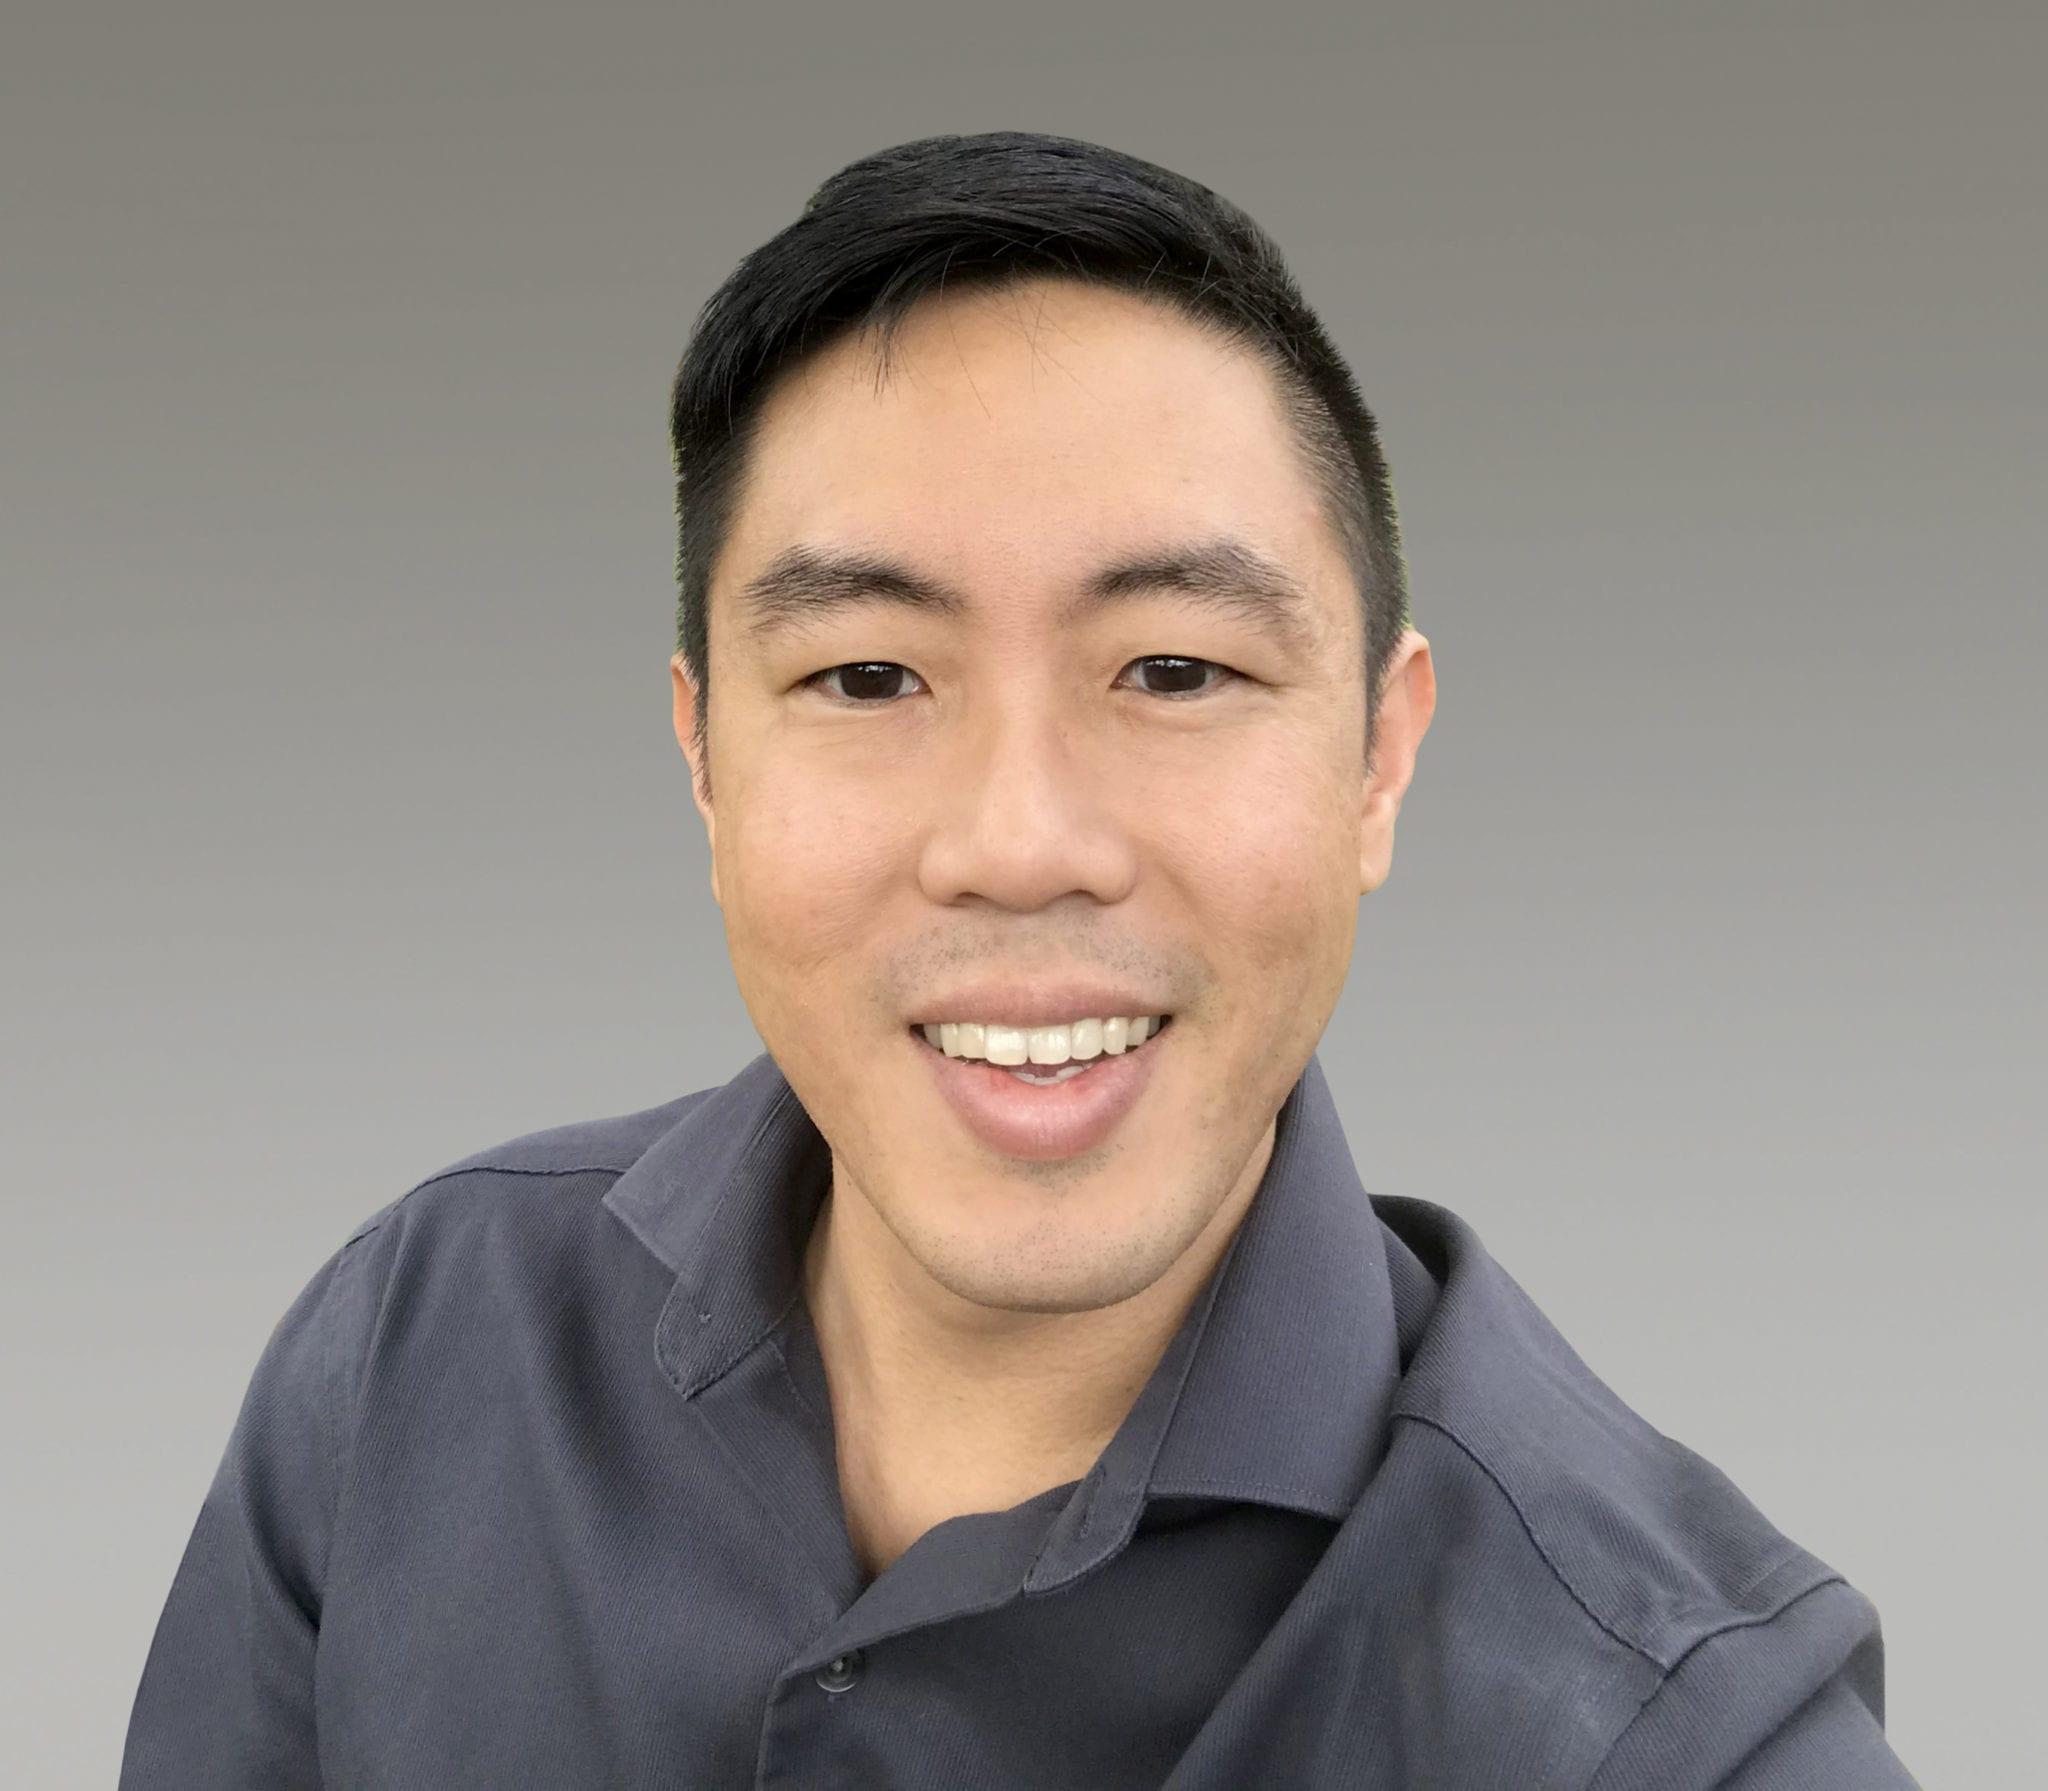 Joel Mercado